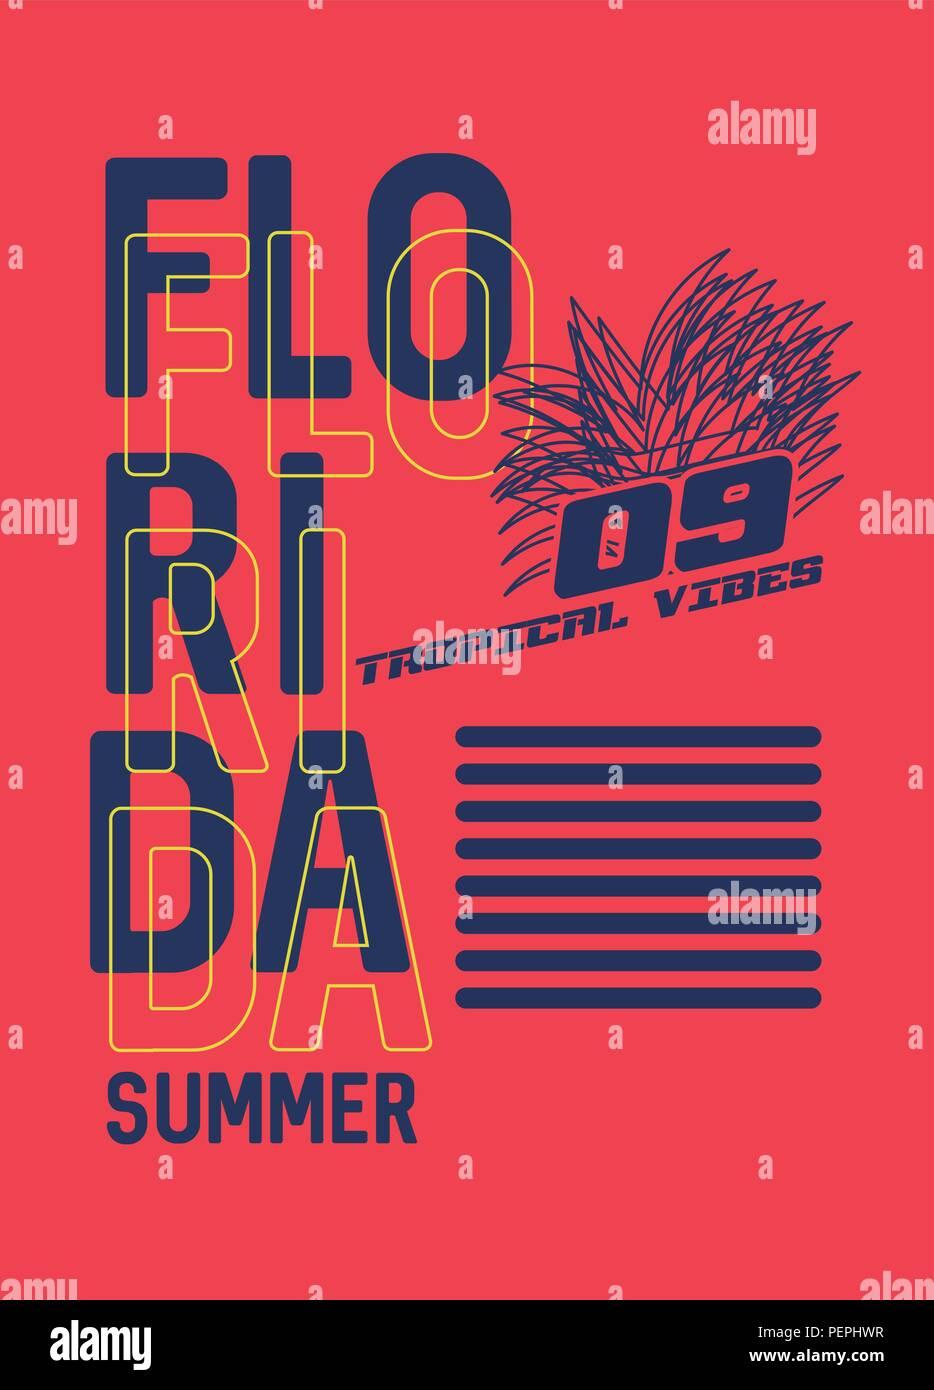 Florida Summer T Shirt Design Vector Illustraton Stock Vector Art